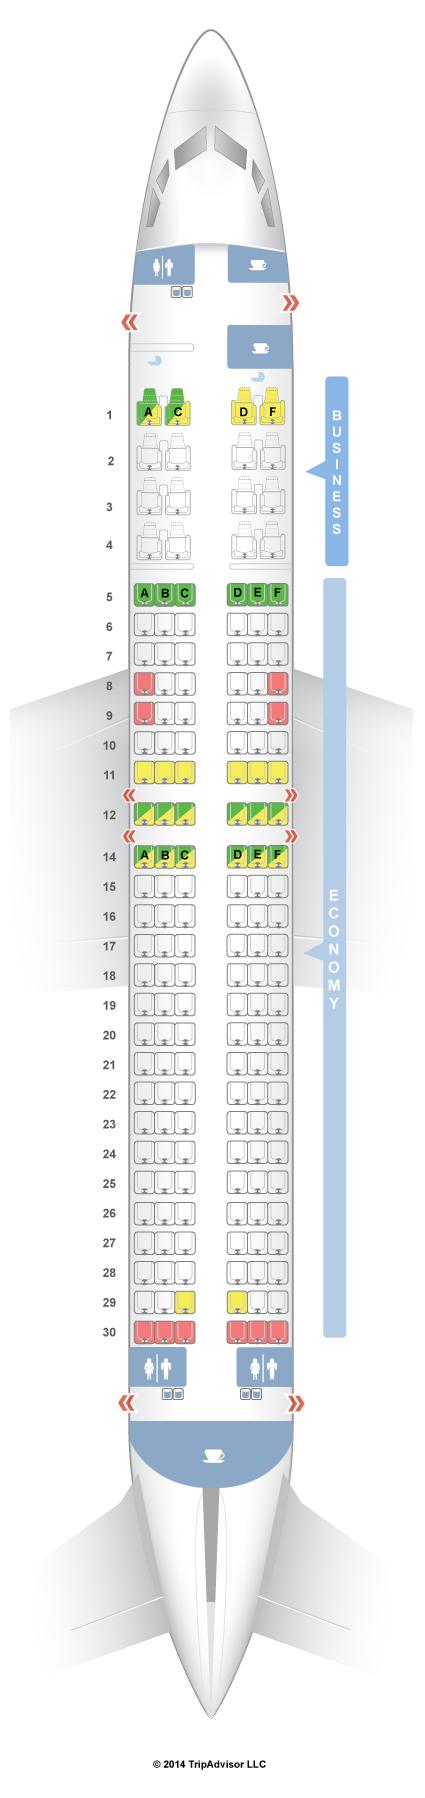 Seatguru Seat Map Malaysia Airlines Boeing 737 800 738 V1